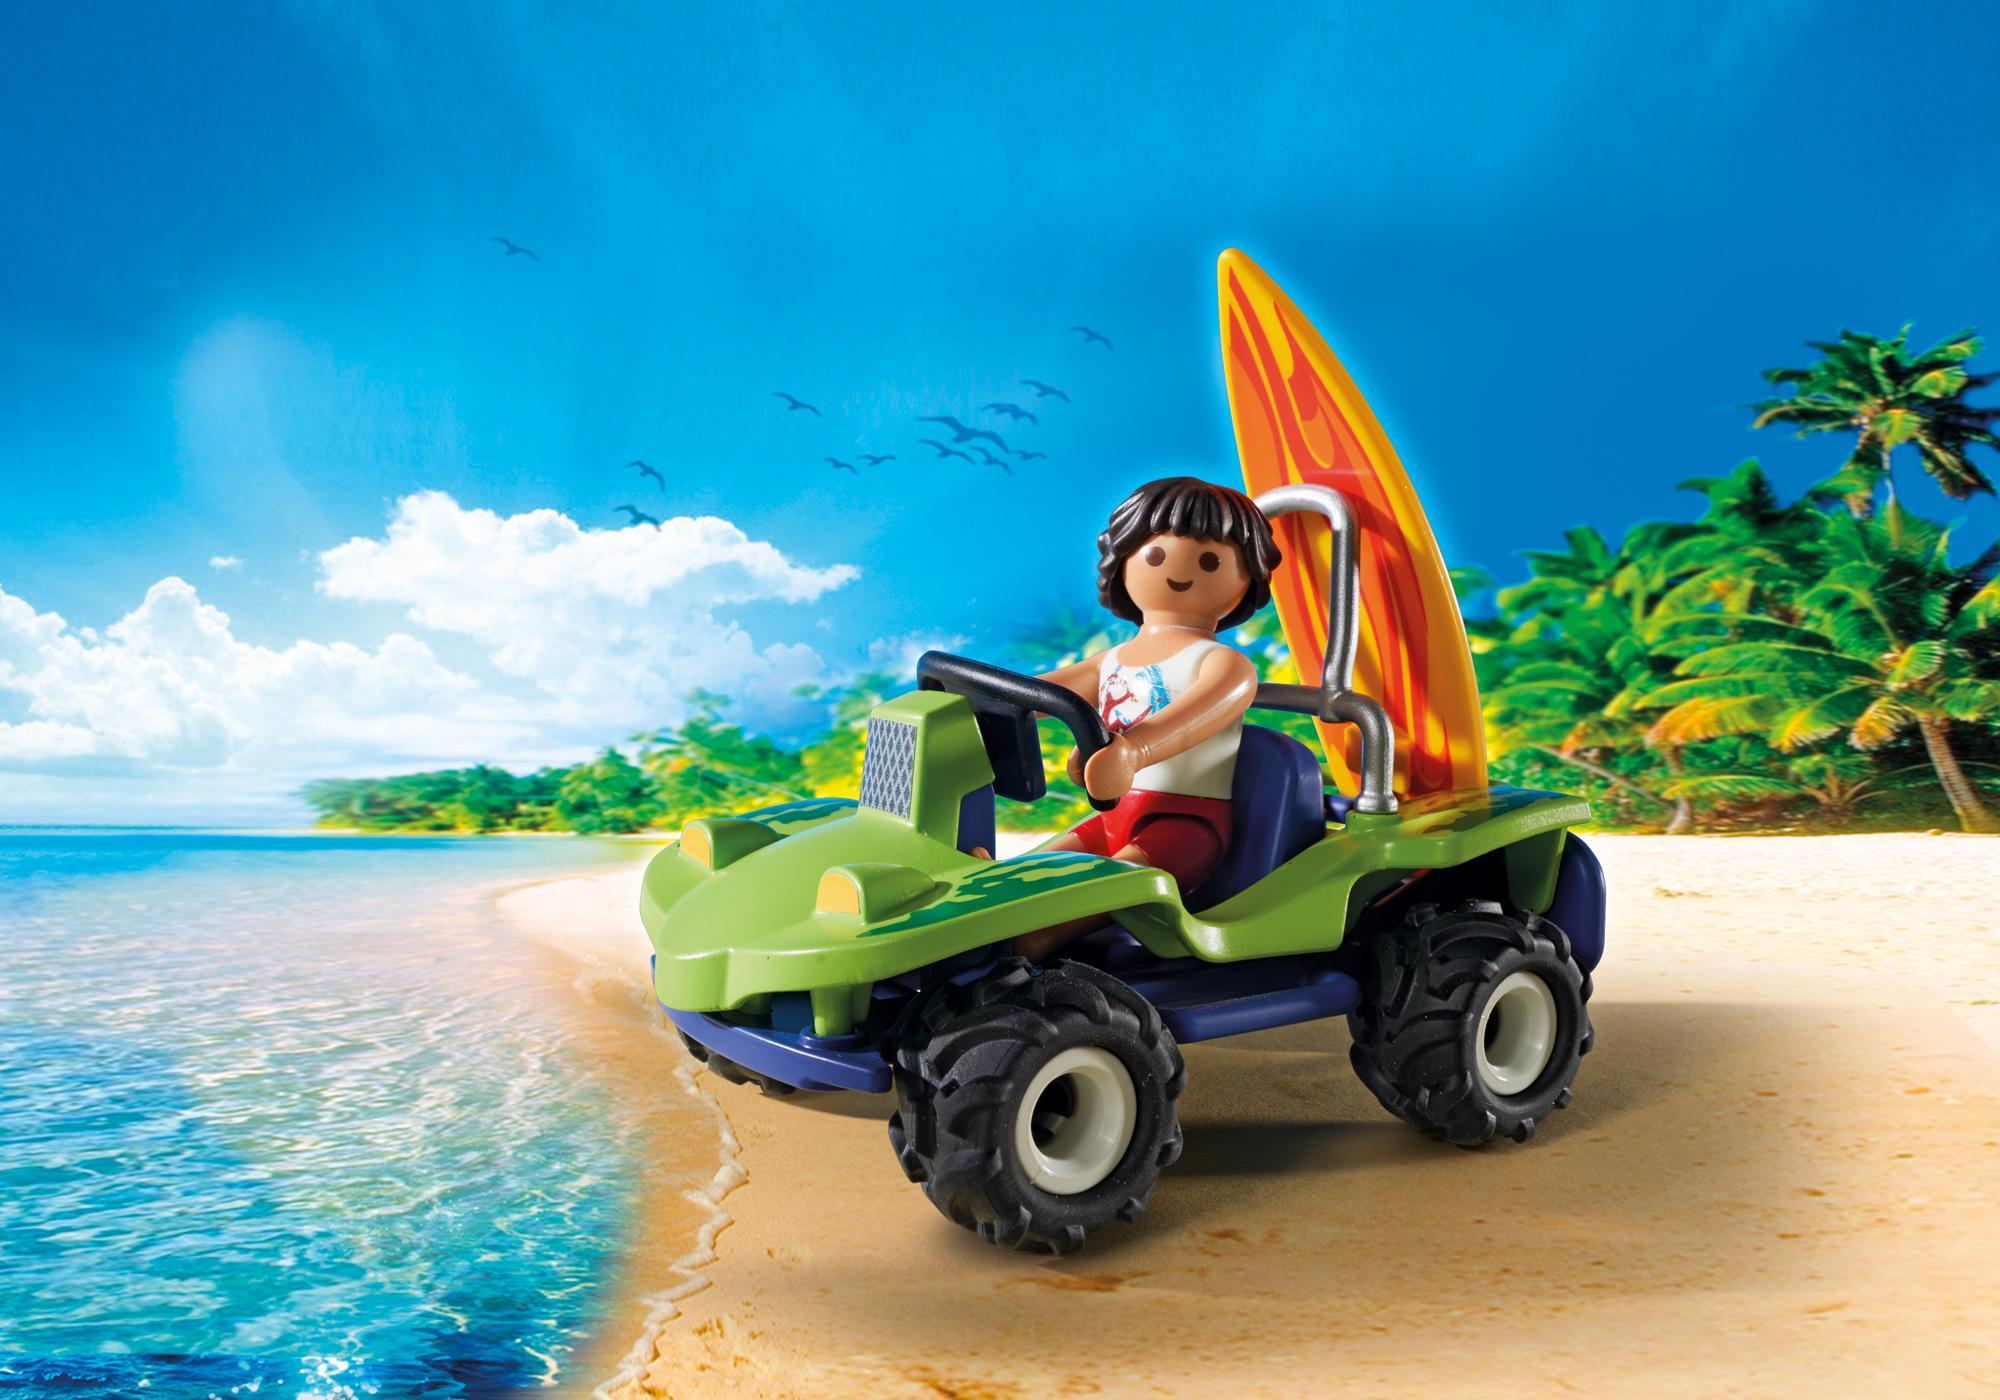 http://media.playmobil.com/i/playmobil/6982_product_extra1/Surfista con Buggy